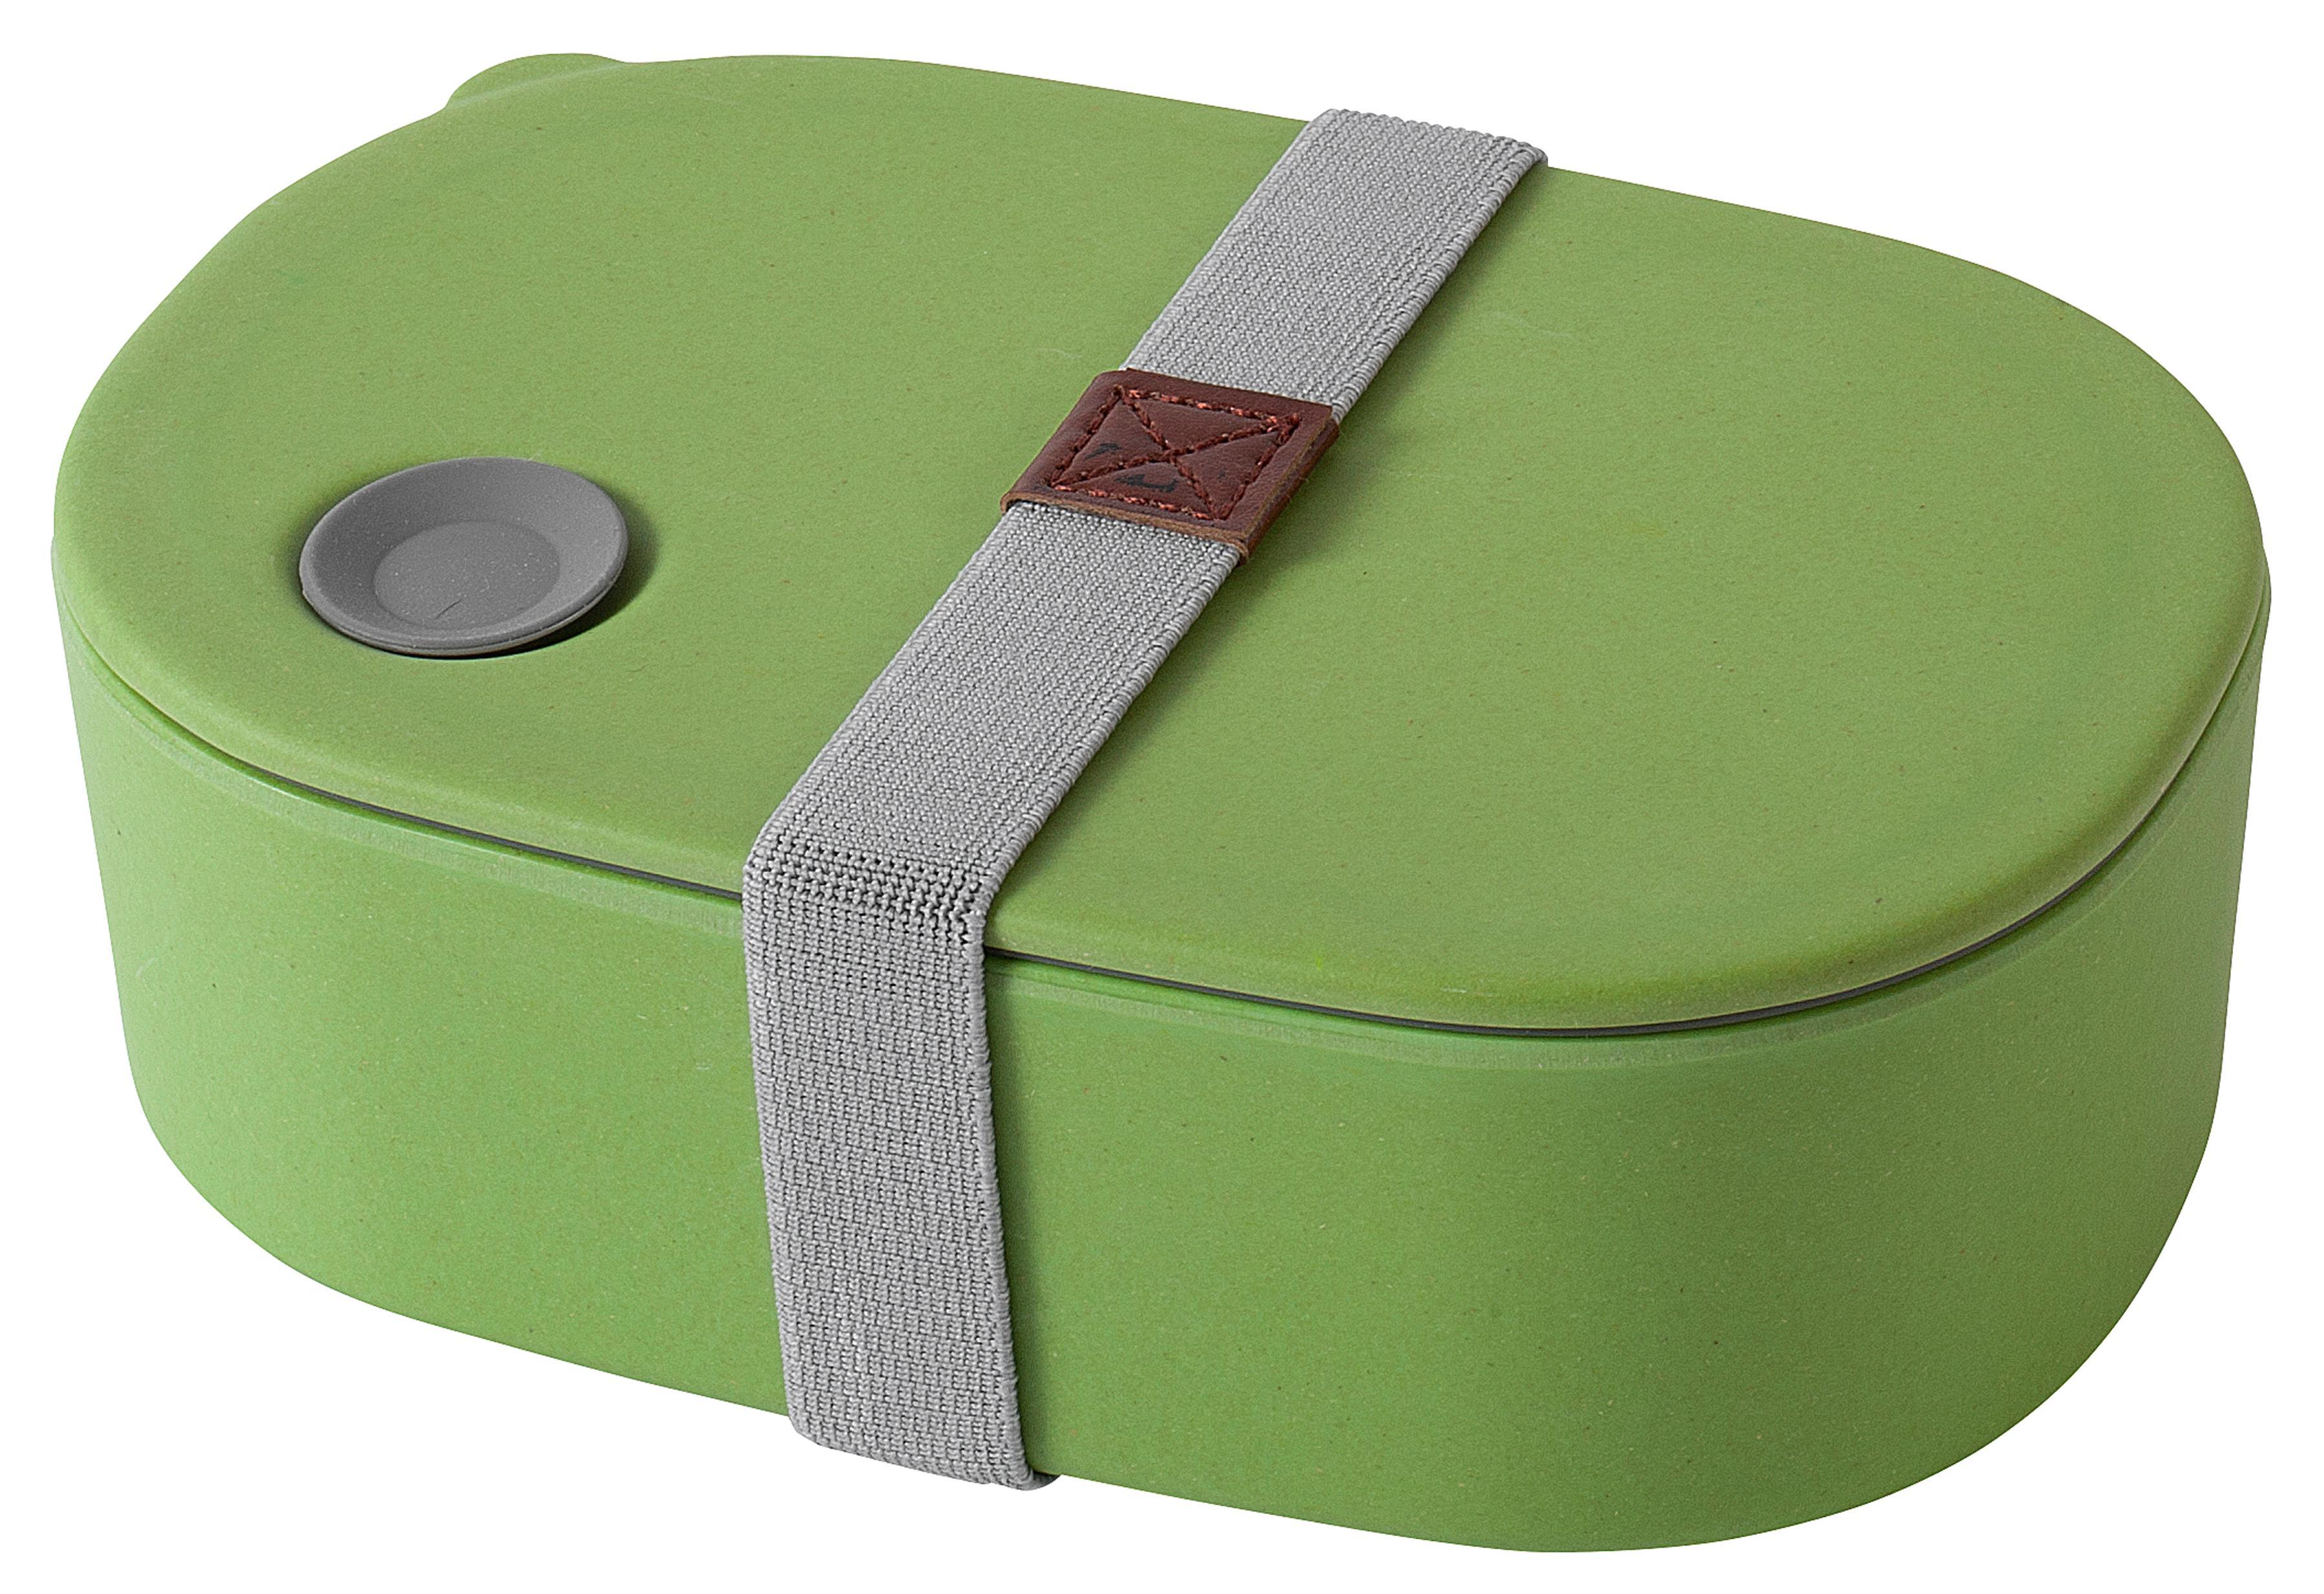 MAGU Lunchbox Natur Design oval grün ca. 70 % Cellulose (gewonnen aus Bambusfasern, Maisstärke und Holzfasern) / ca. 30 % Harze, lebensmittelecht